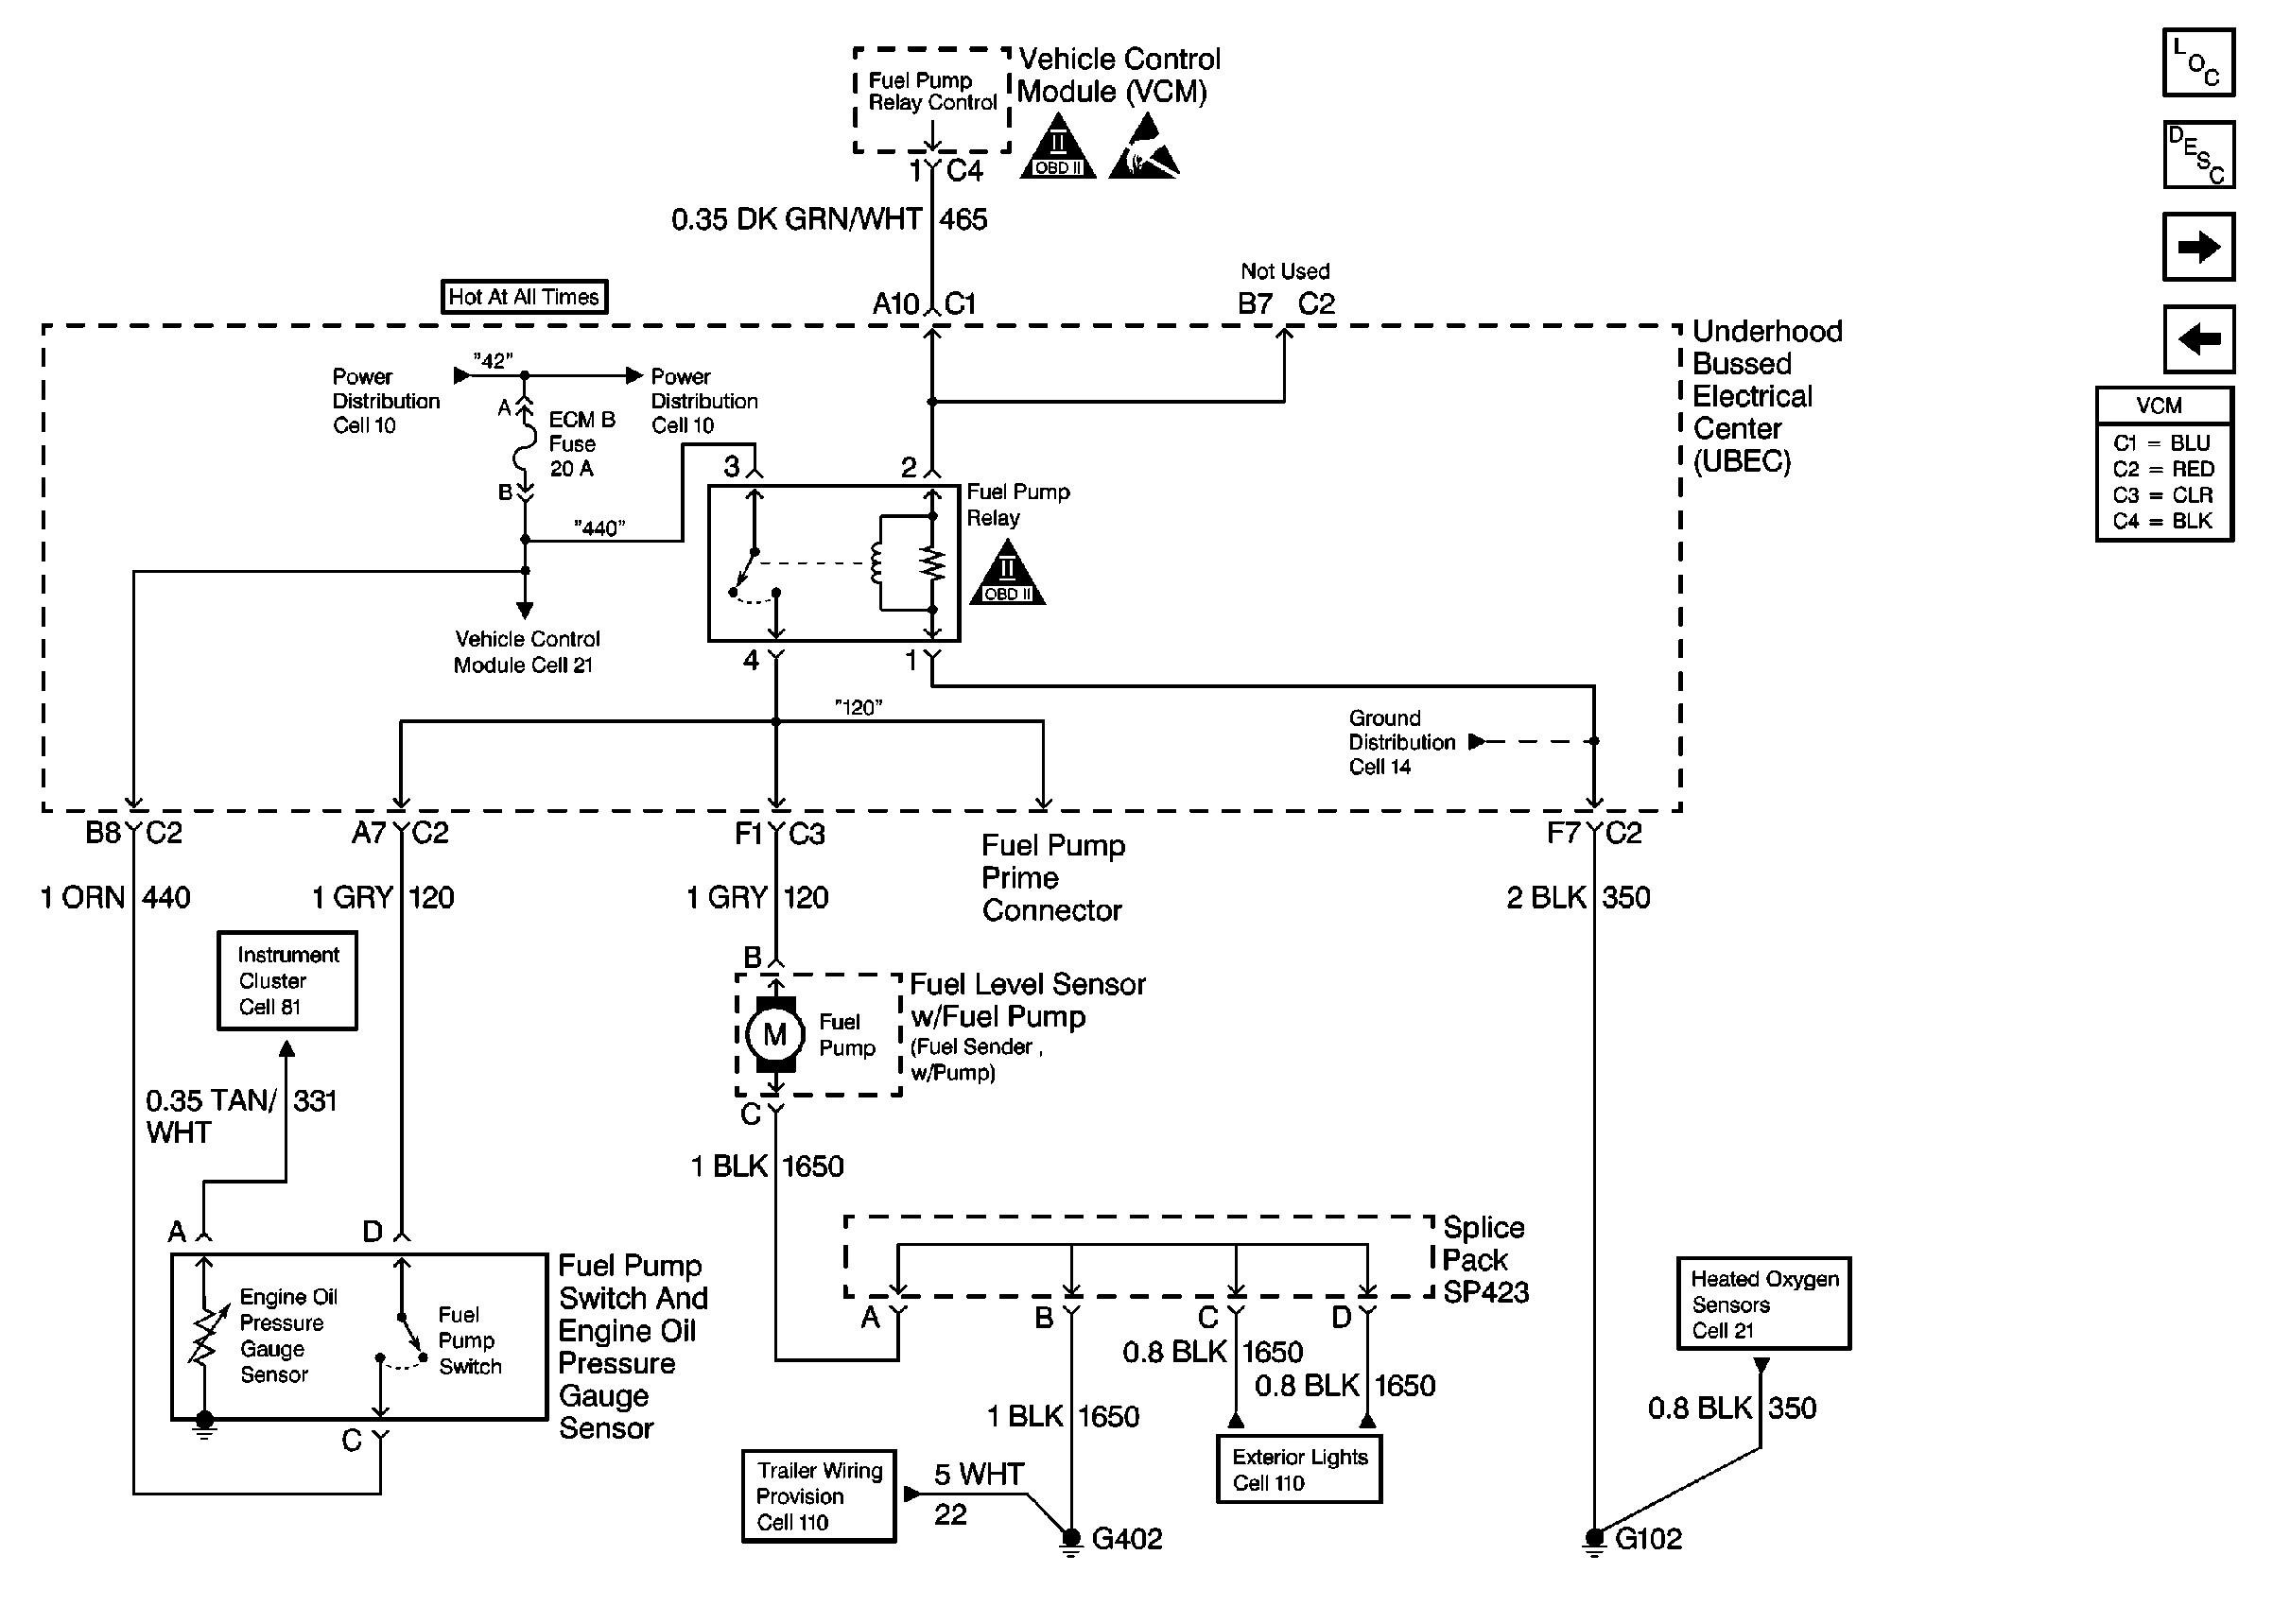 4 3 Astro Van Starter Wiring Diagram | Wiring Library - Trailer Breakaway Switch Wiring Diagram